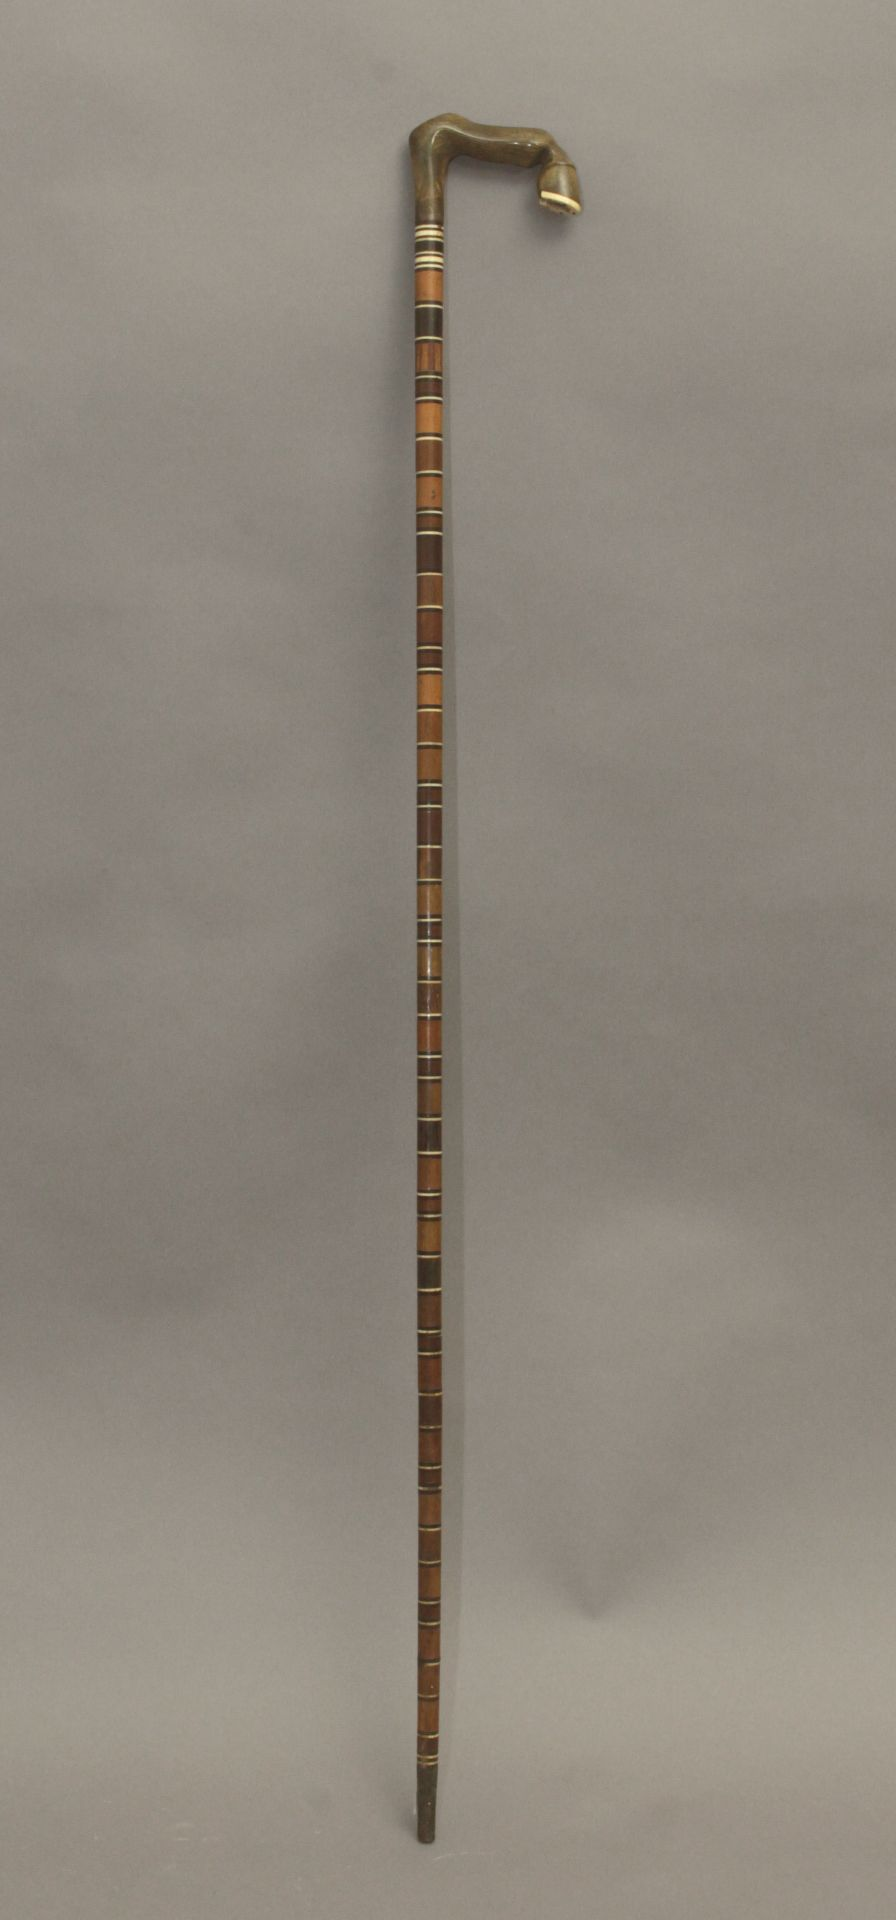 A 20th century wood, horn and bone sample walking cane - Bild 3 aus 7